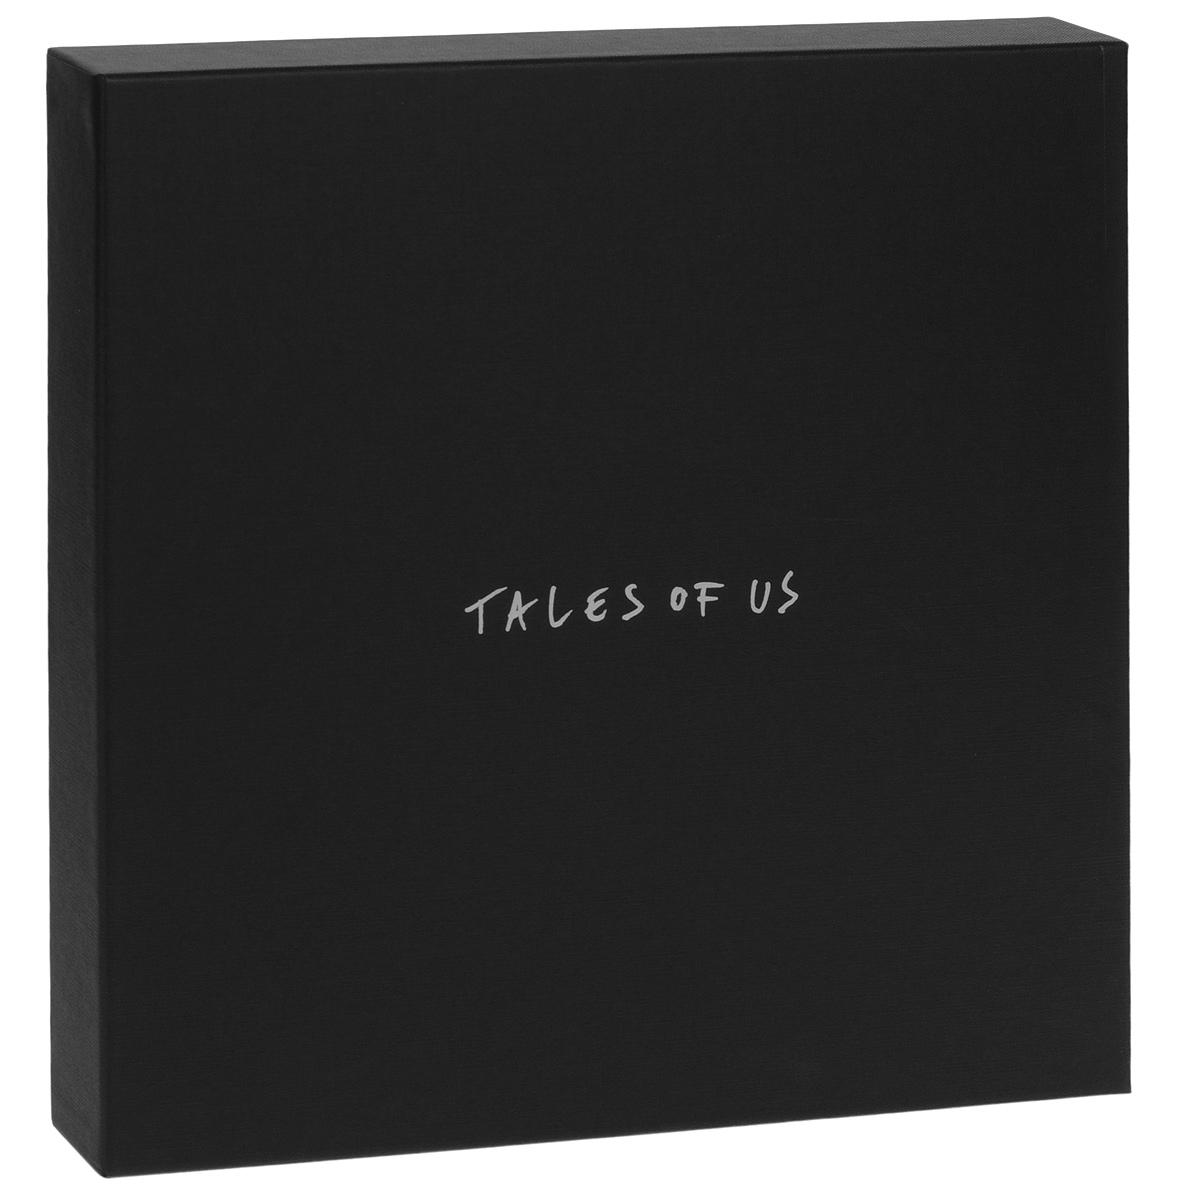 Goldfrapp Goldfrapp. Tales Of Us (2 CD + DVD + LP) музыка dvd audio dts